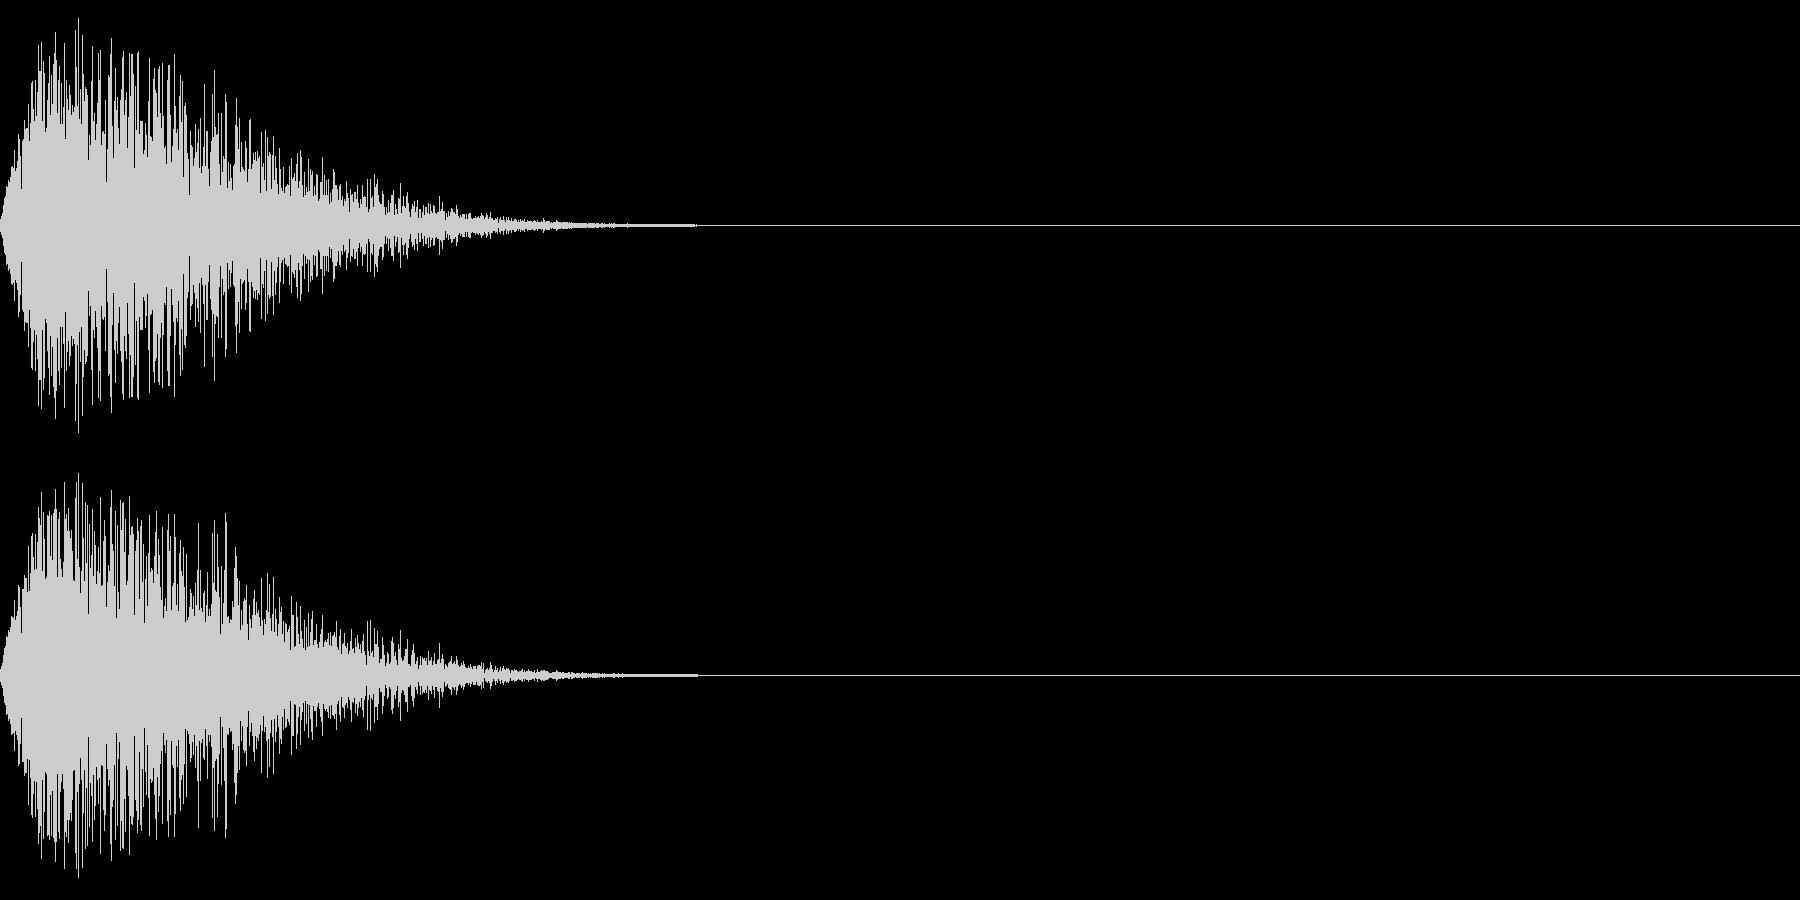 DTM Snare 14 オリジナル音源の未再生の波形